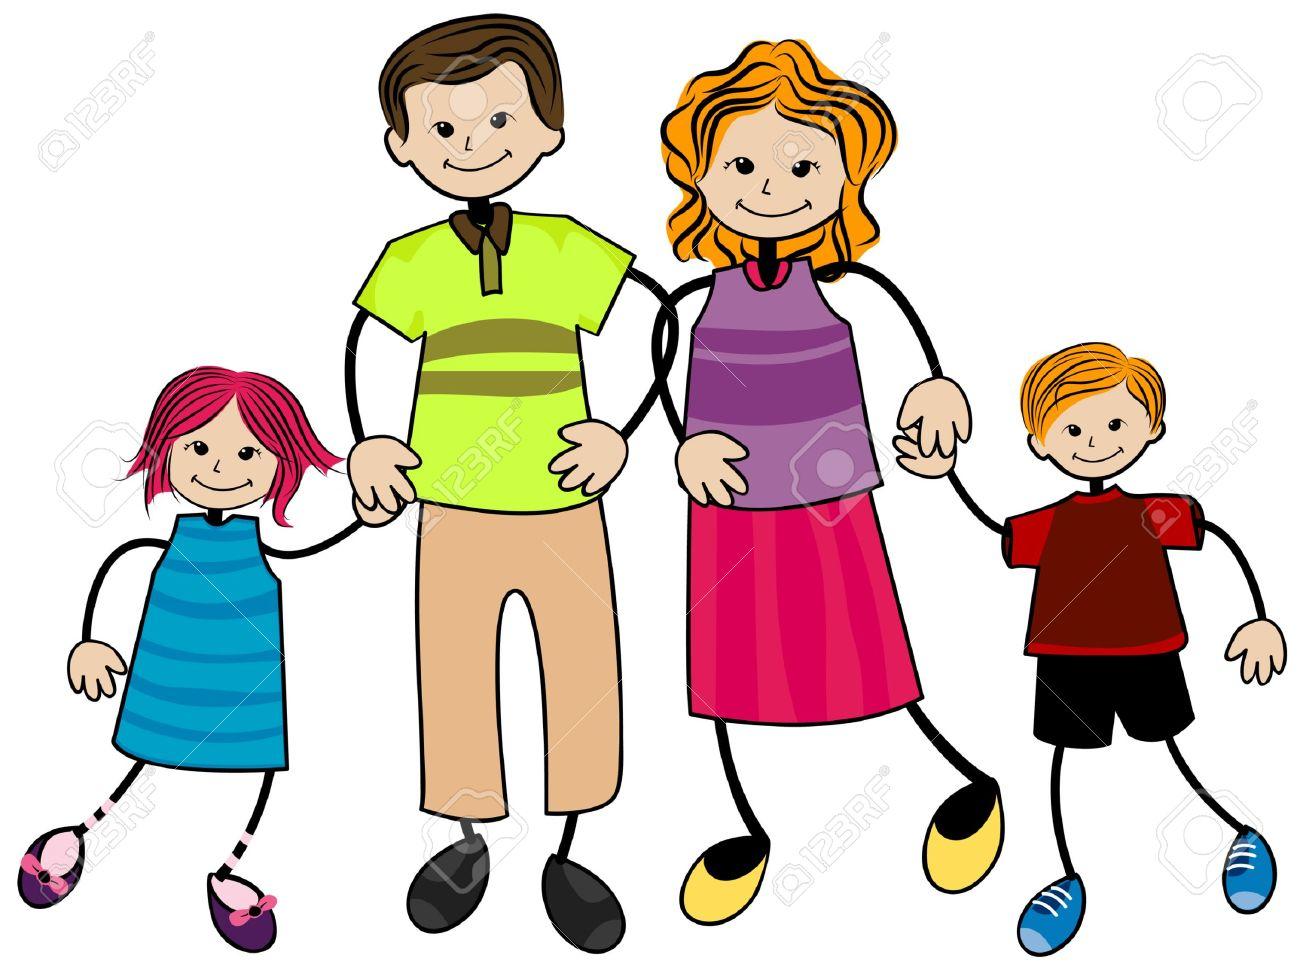 Family Clipart Free Clipart-Family Clipart Free Clipart-14